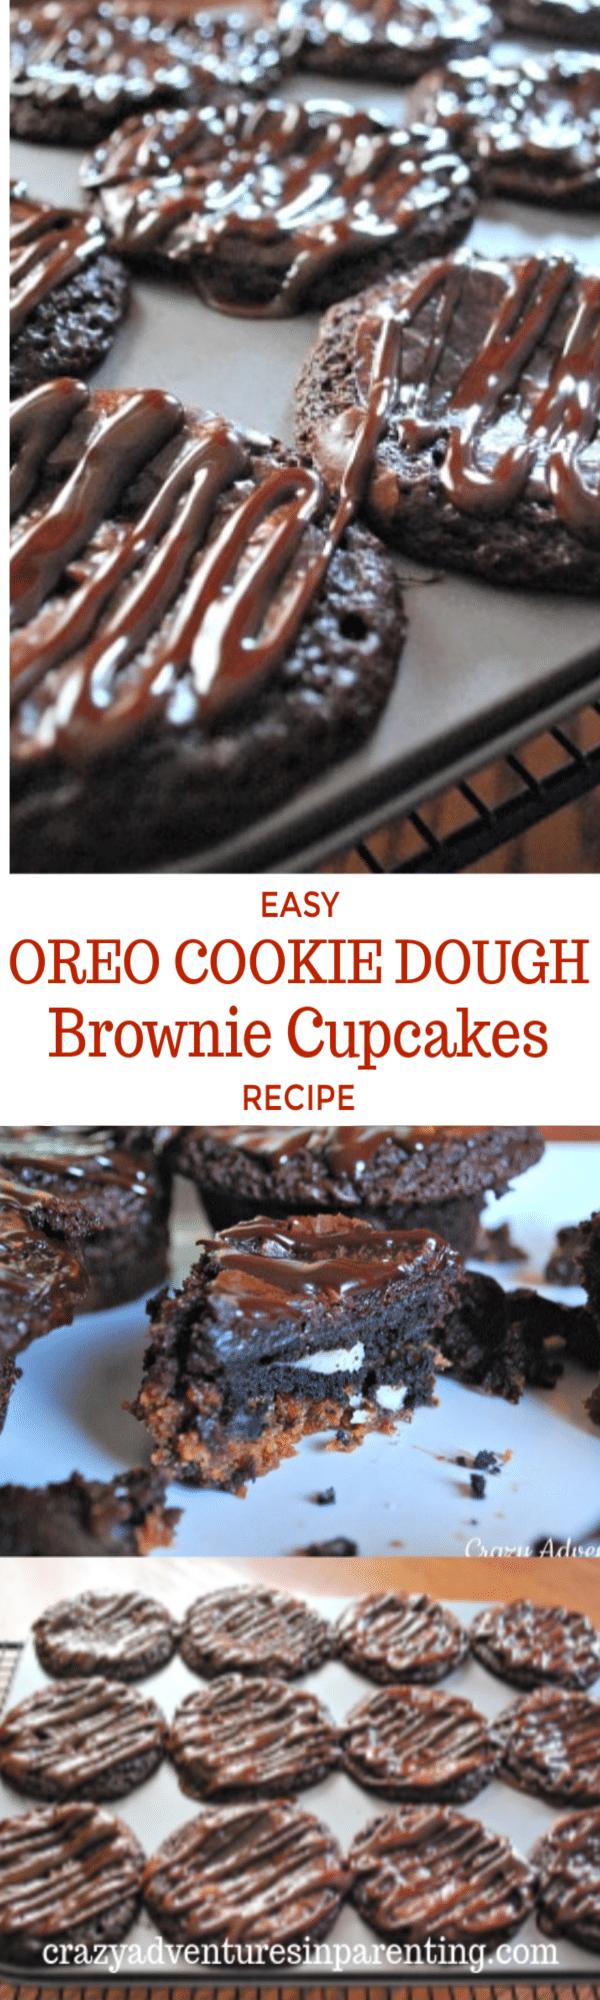 Easy Oreo Cookie Dough Brownie Cupcakes Recipe